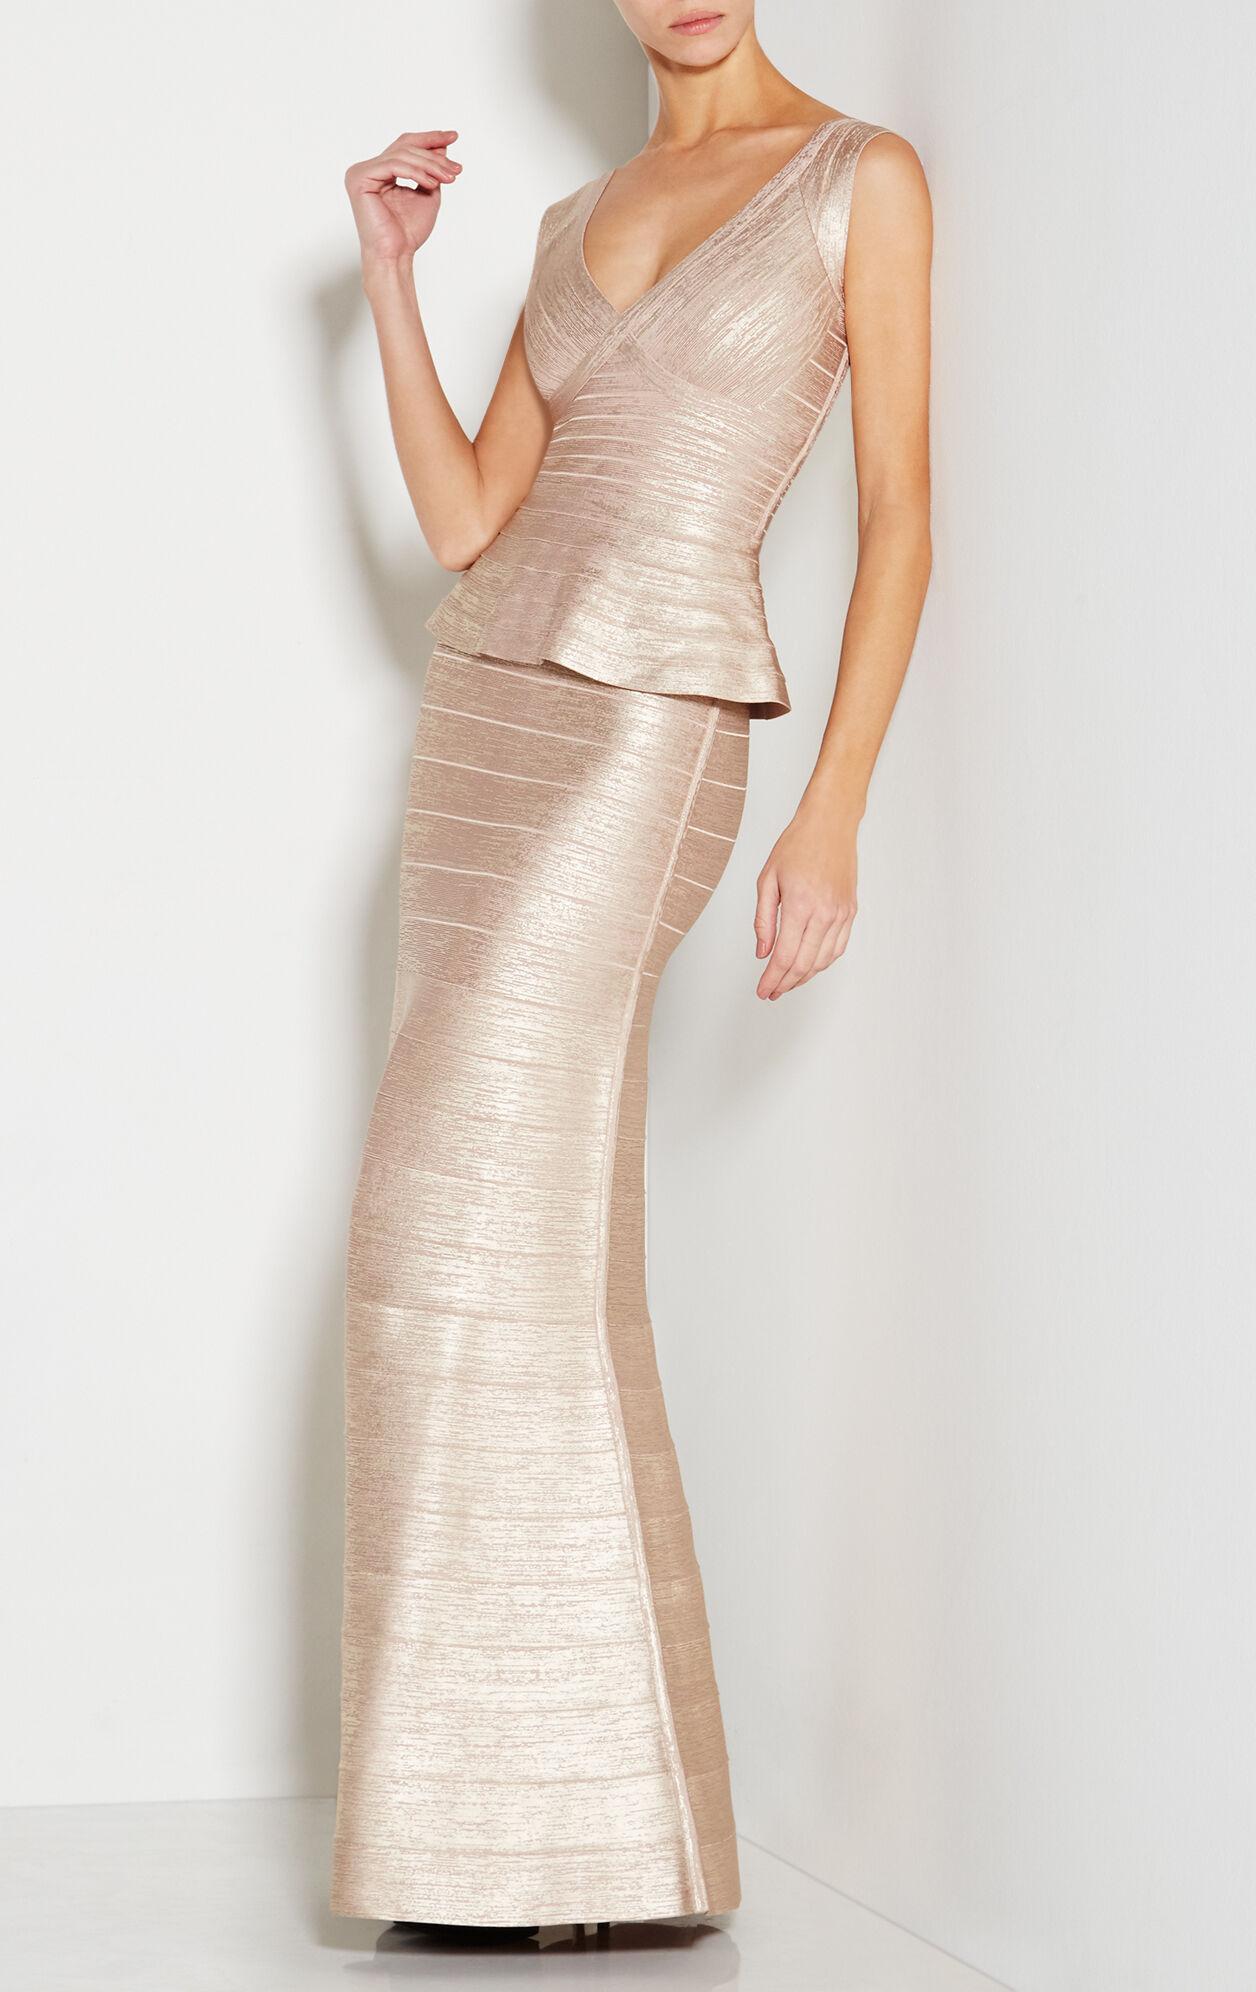 Izabela Woodgrain Foil Print Dress